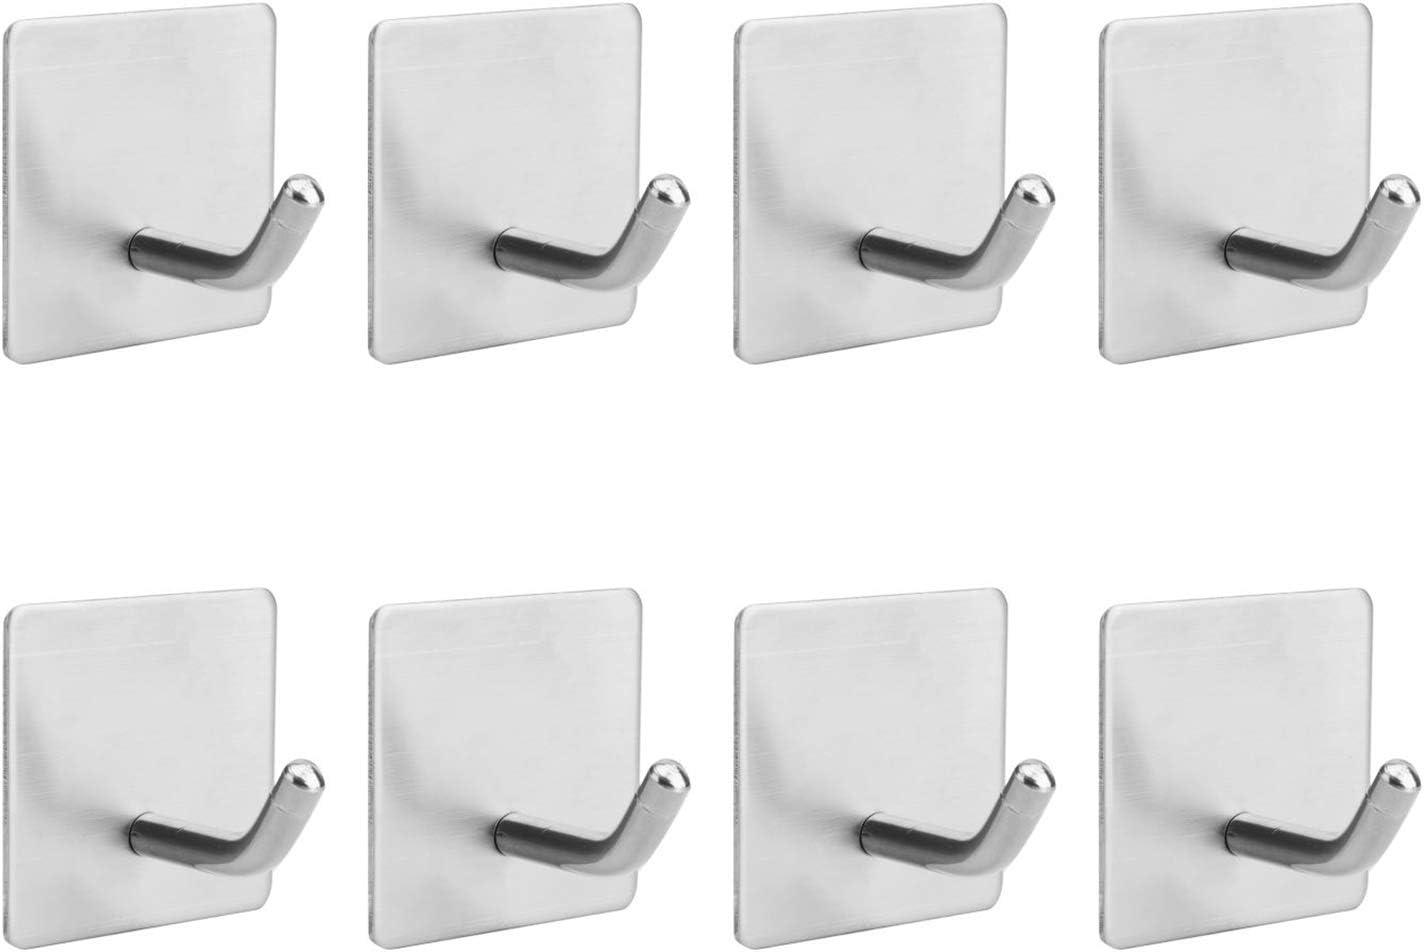 Cabinet Closet Hedume 8 Pack Adhesive Hooks 304 Stainless Steel Waterproof Hangers Hooks for Hanging in Bathroom Heavy Duty Stick on Wall and Door Home Door Kitchen